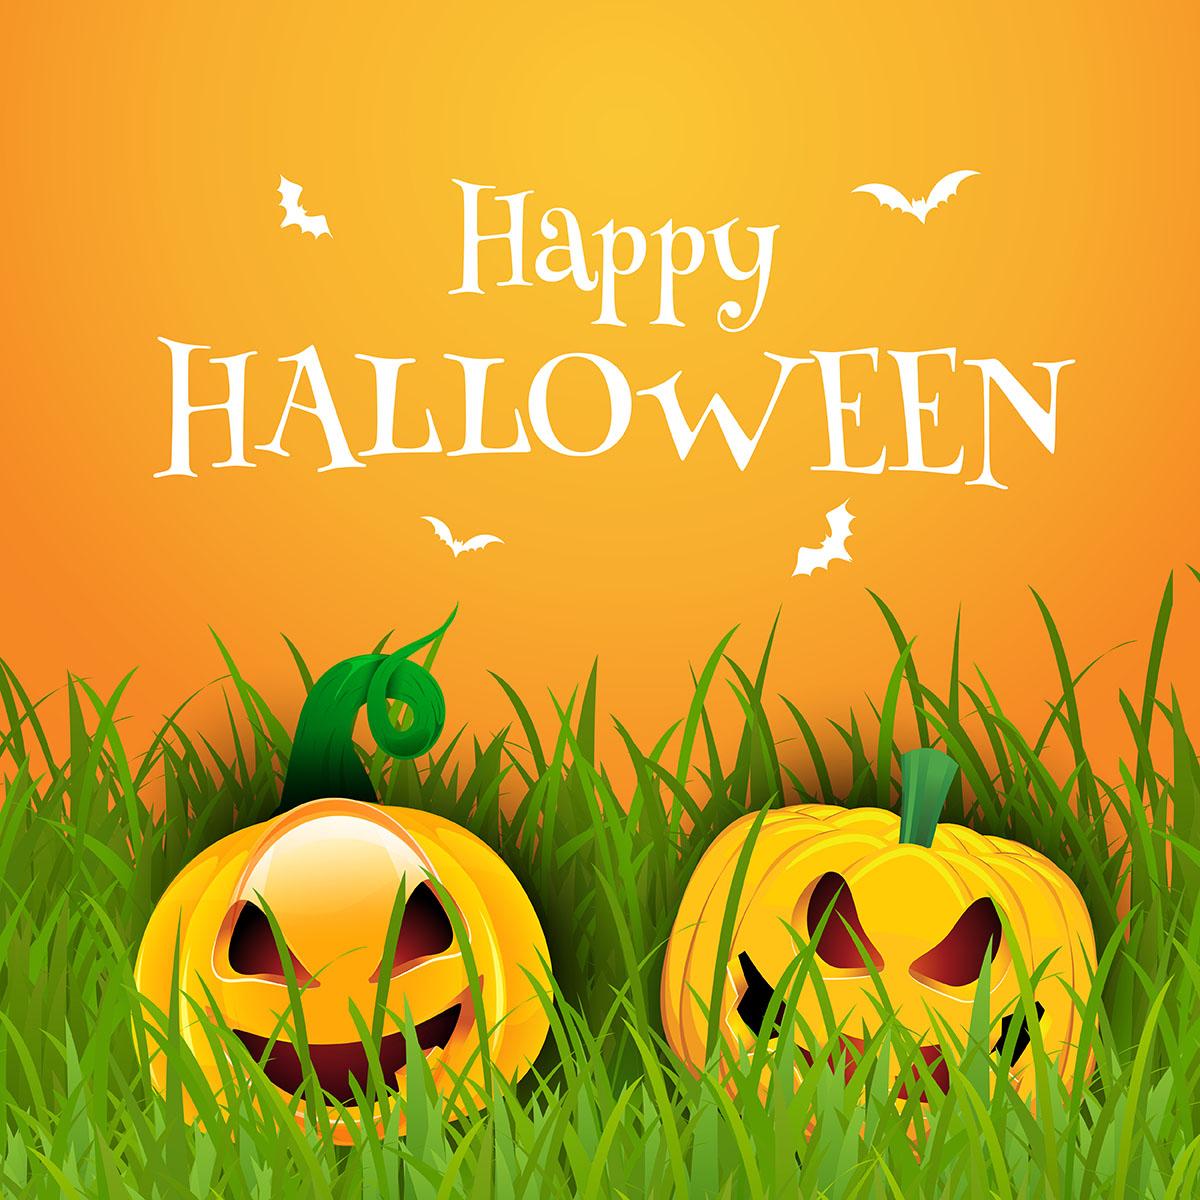 Happy Halloween Background With Pumpkins Download Free